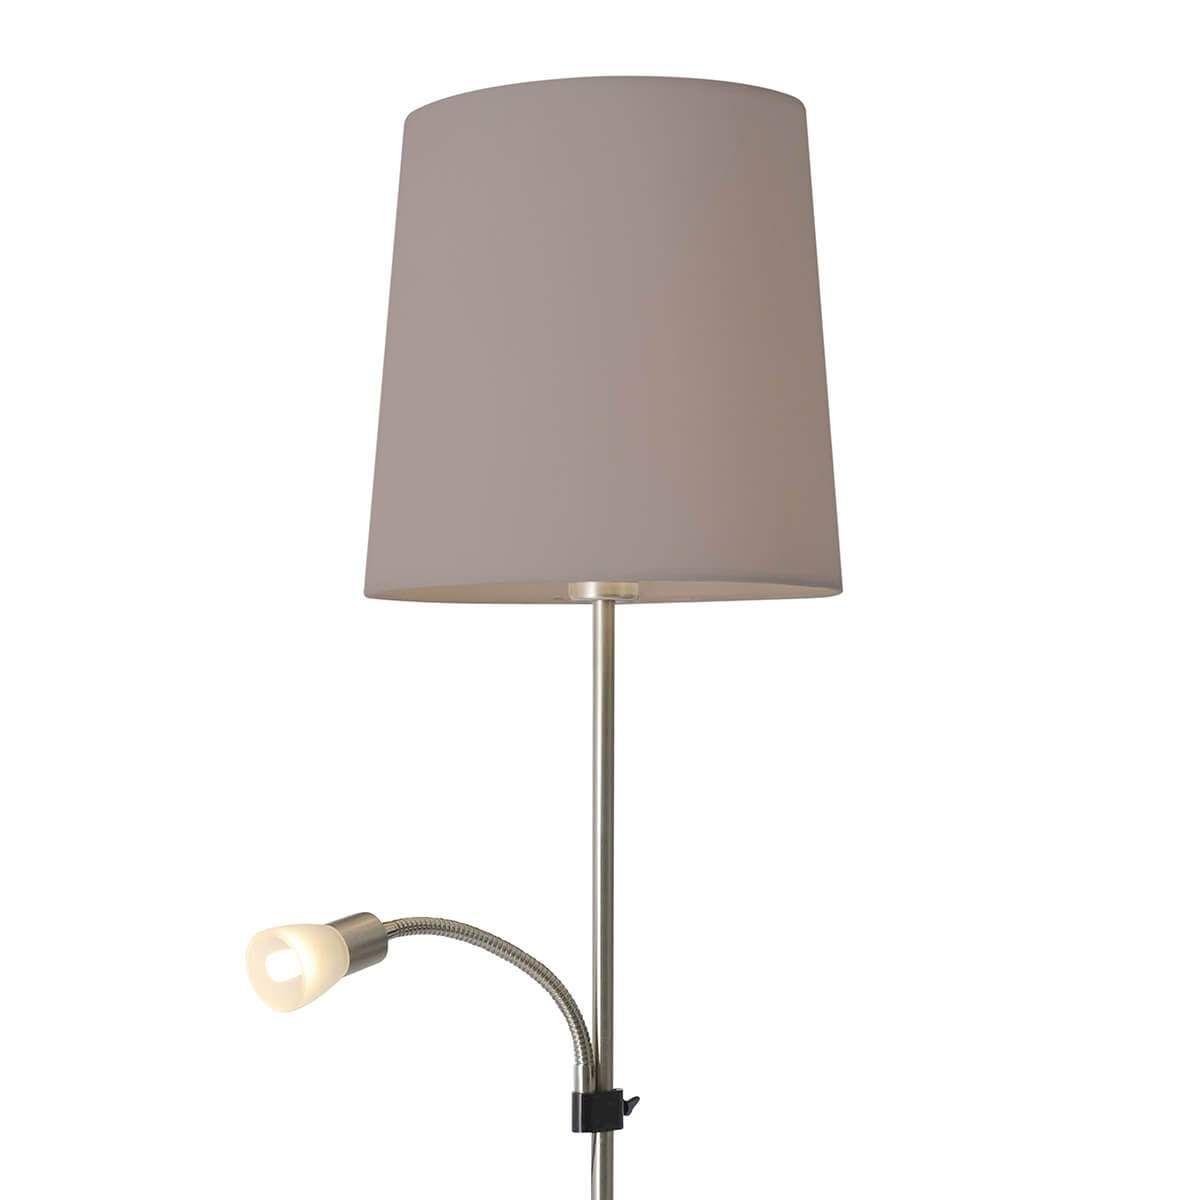 Moderne Stehlampe Lara Von Naeve Leuchten Grau Led Leselampe